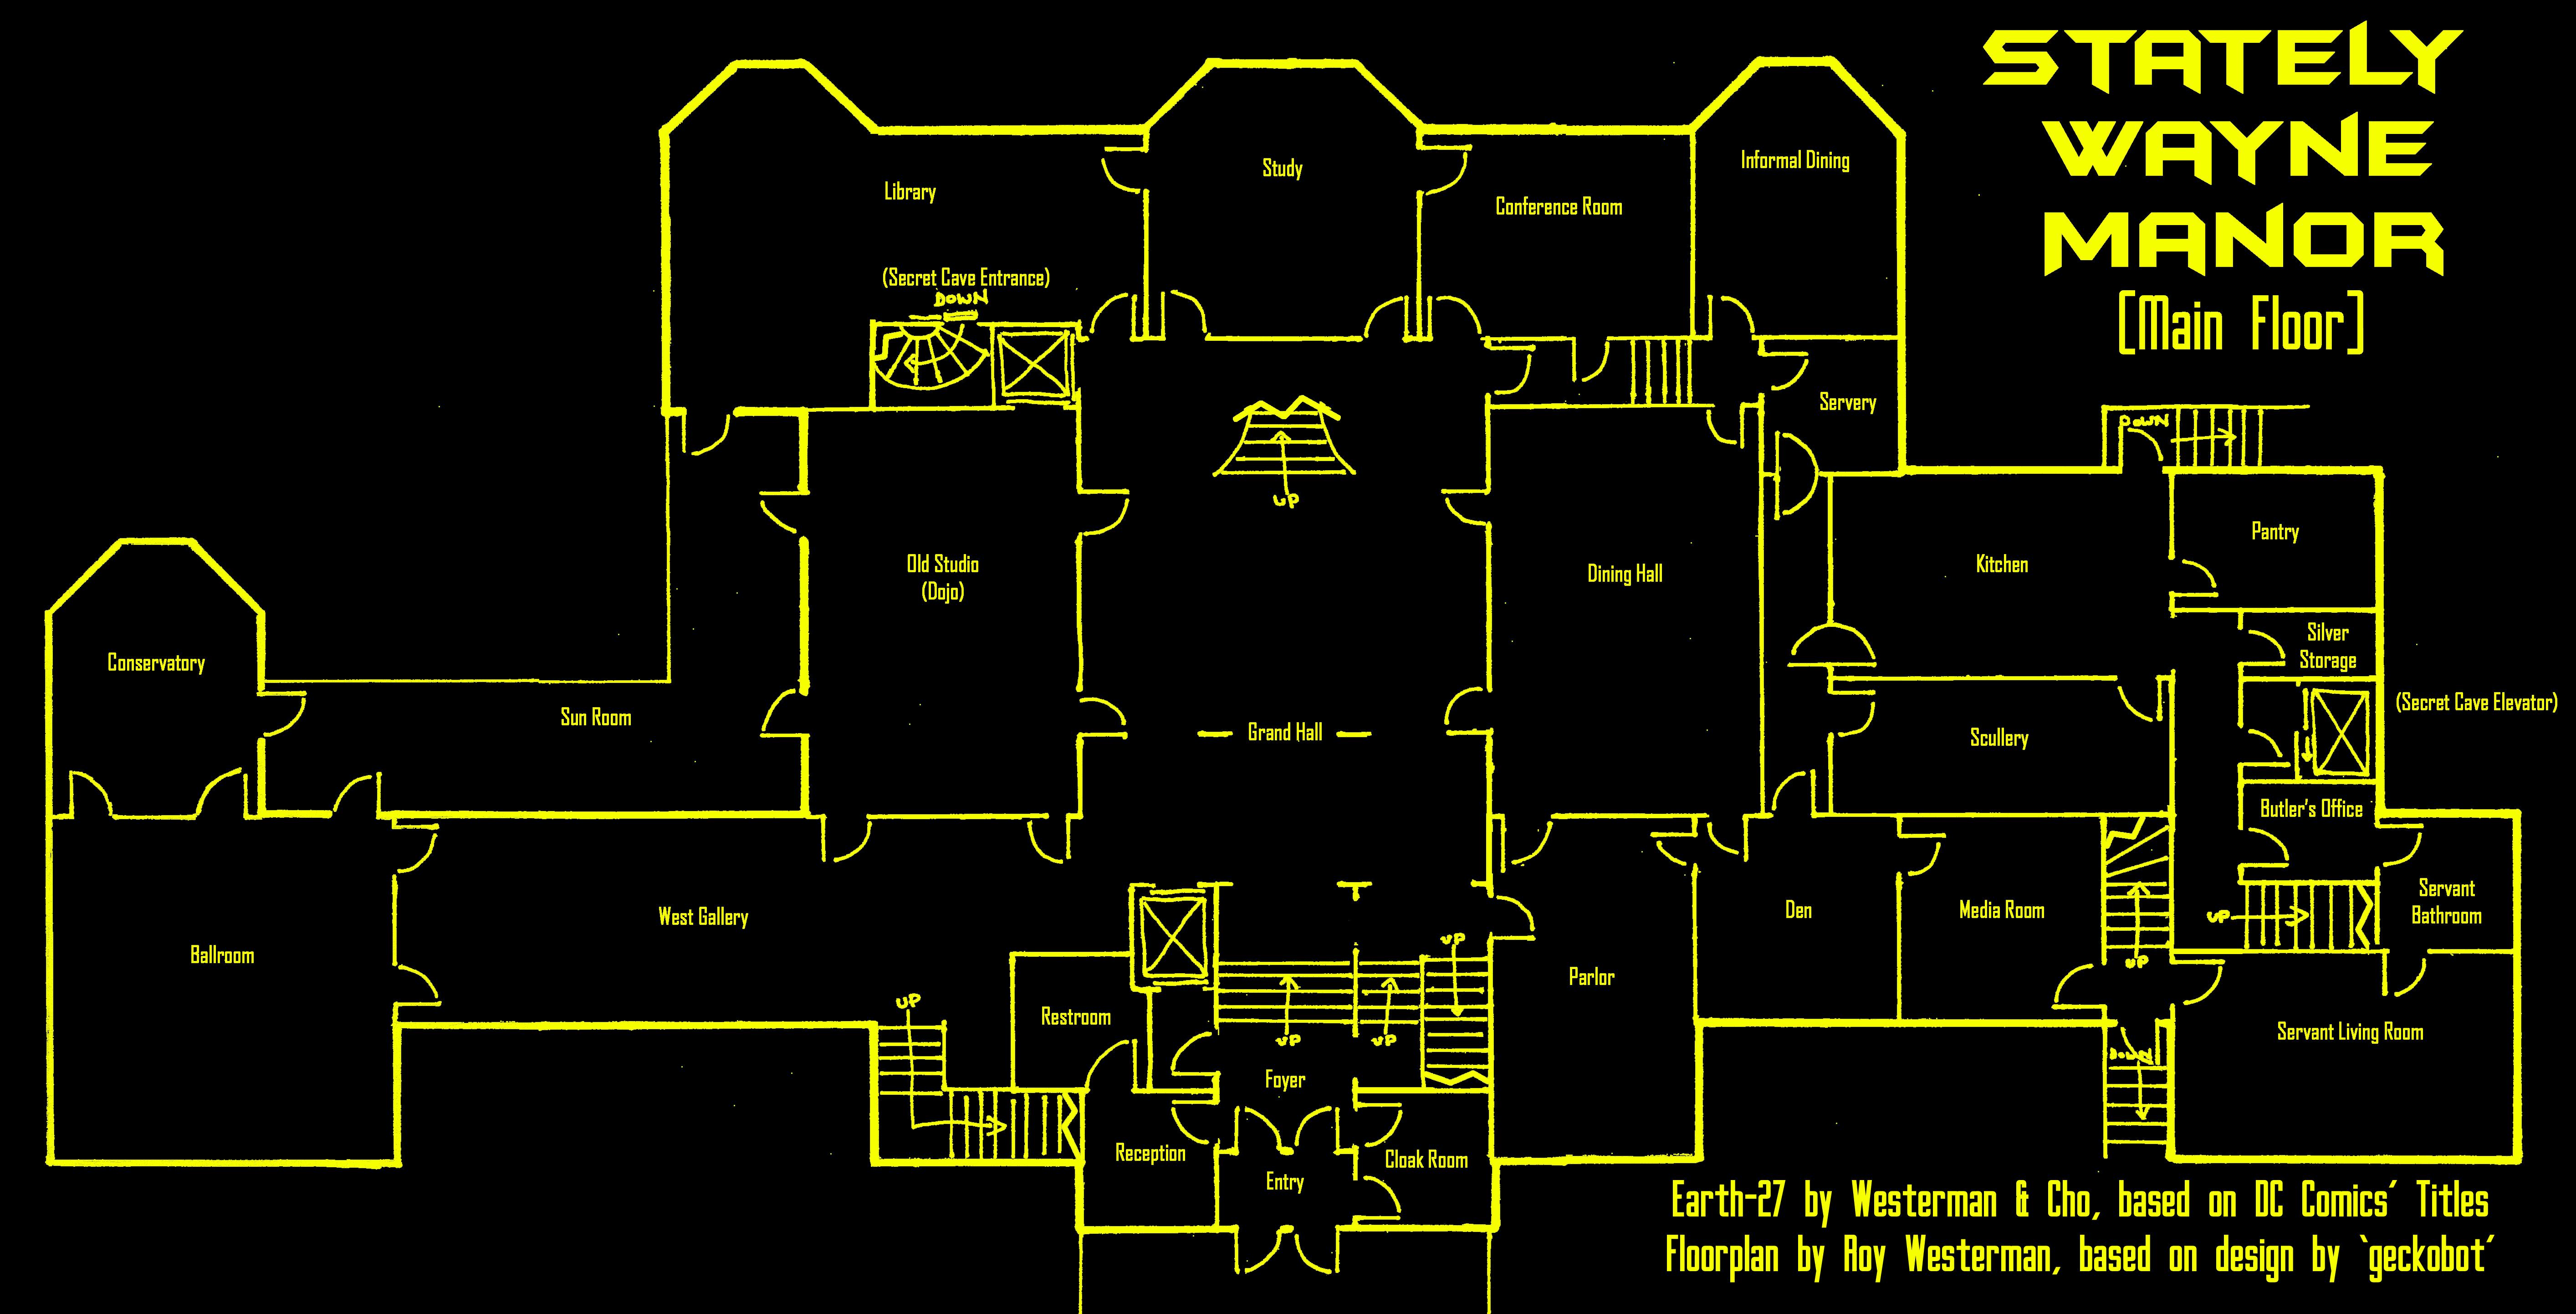 Earth-27's Wayne Manor - Upper by Roysovitch on DeviantArt